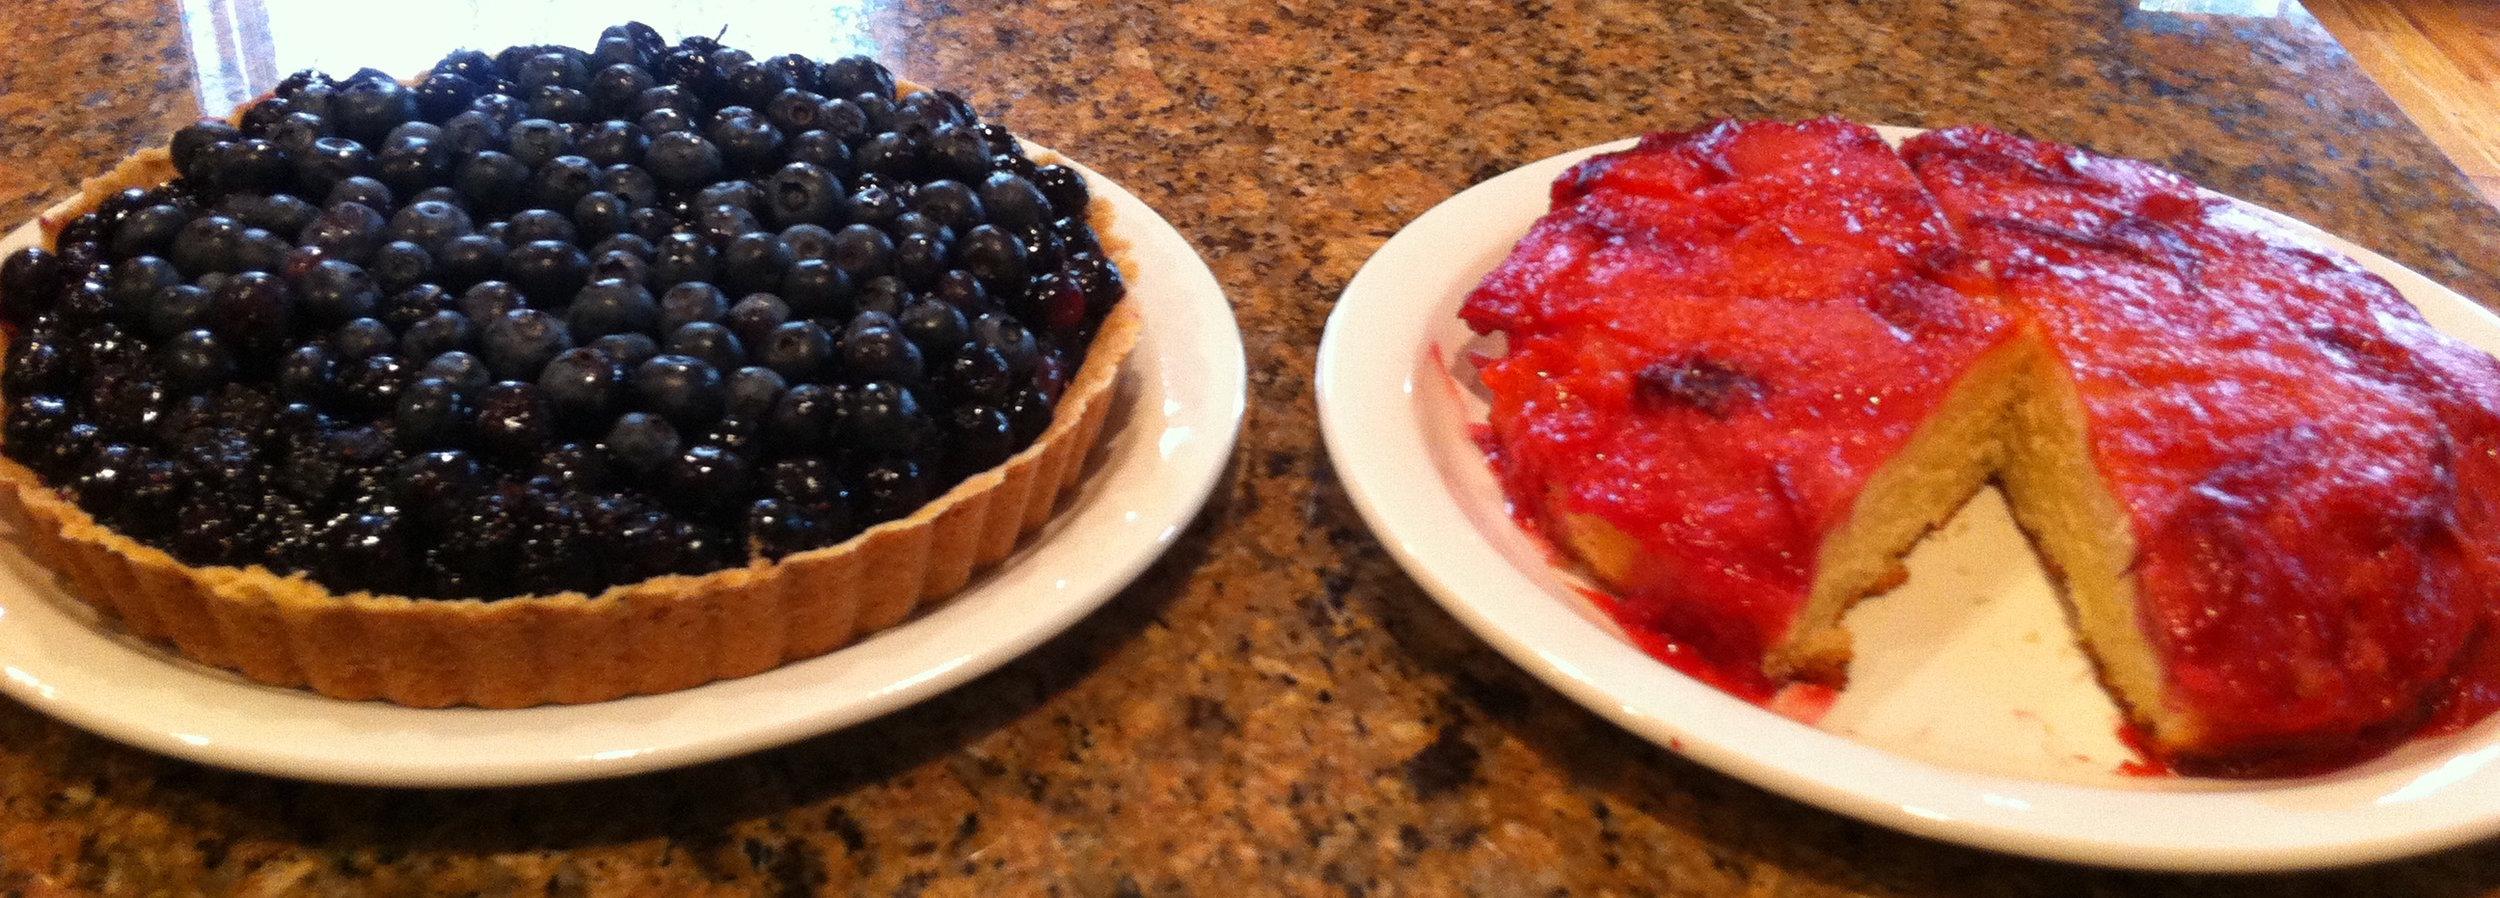 Blueberry Tart/Plum Cake